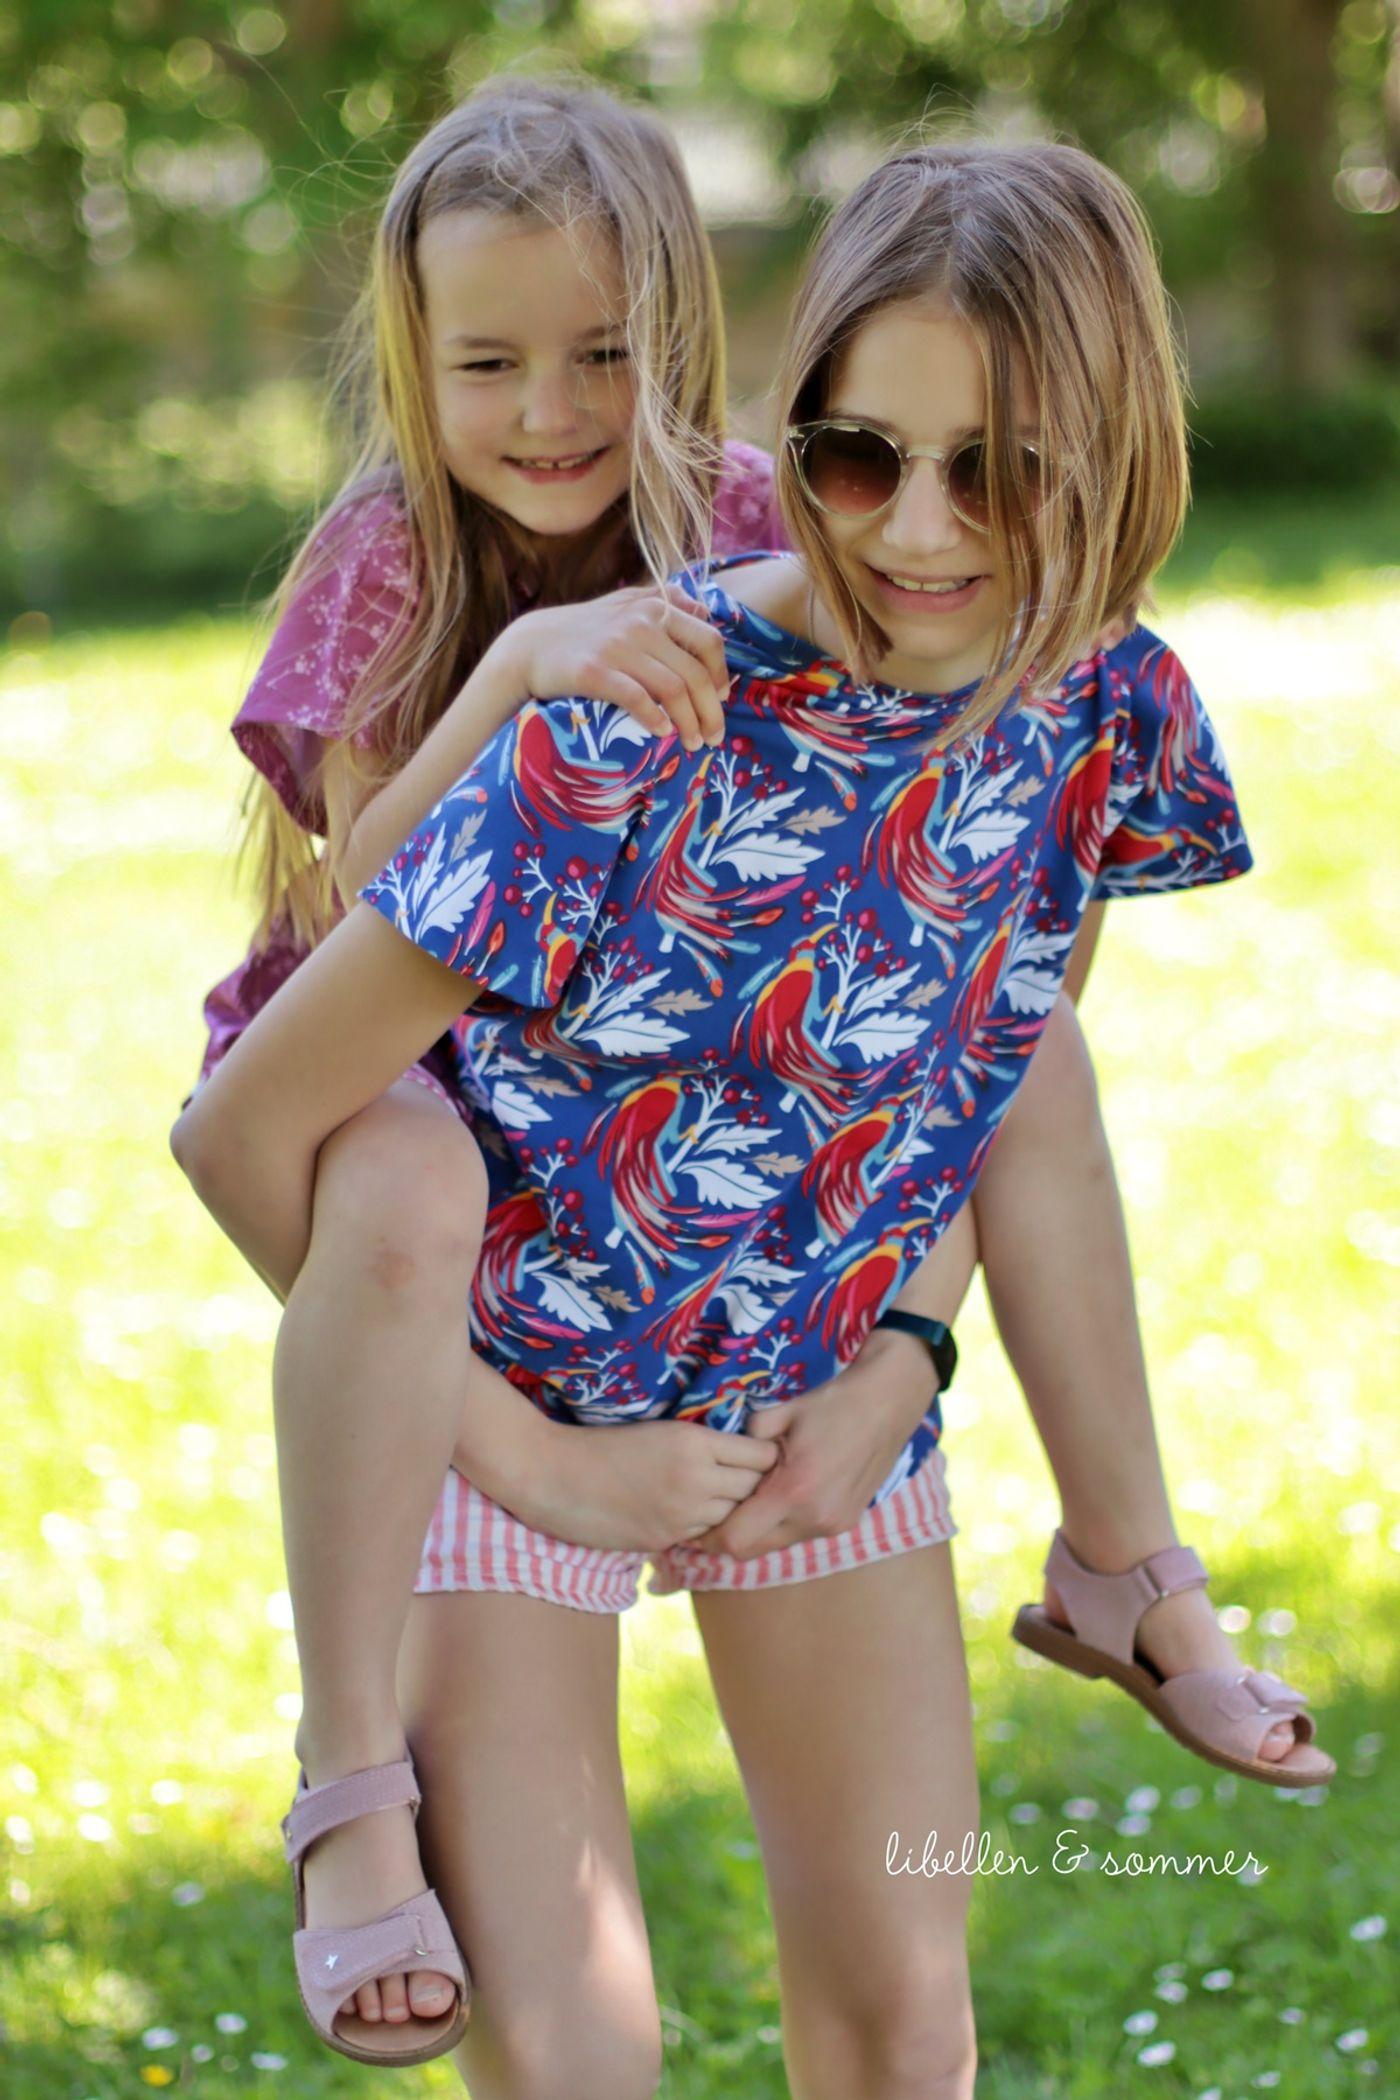 Produktfoto 29 von MiToSa-Kreativ für Schnittmuster Kombi E-Book Family Shirt Kinder, Damen & Männer Gr. 74 - 164, 34 - 52 & XS - 3XL